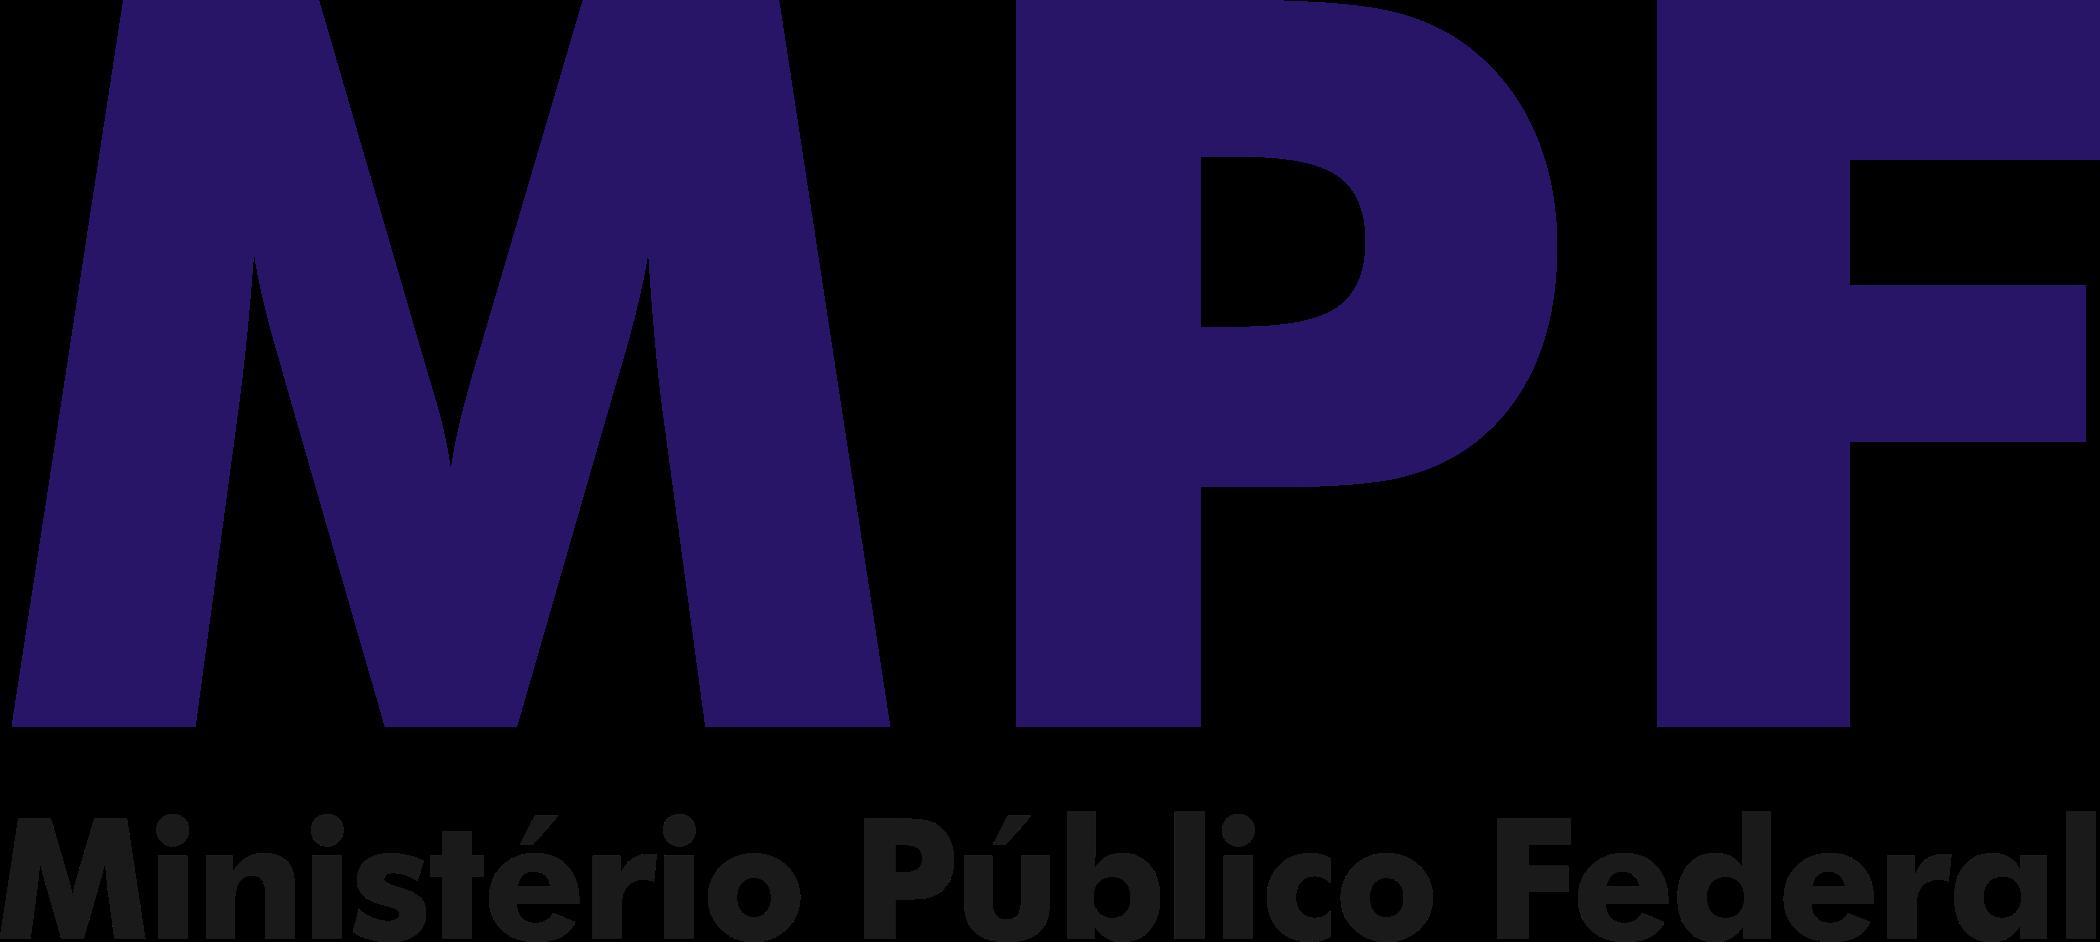 mpf logo ministerio publico federal 1 - MPF Logo - Ministério Publico Federal Logo